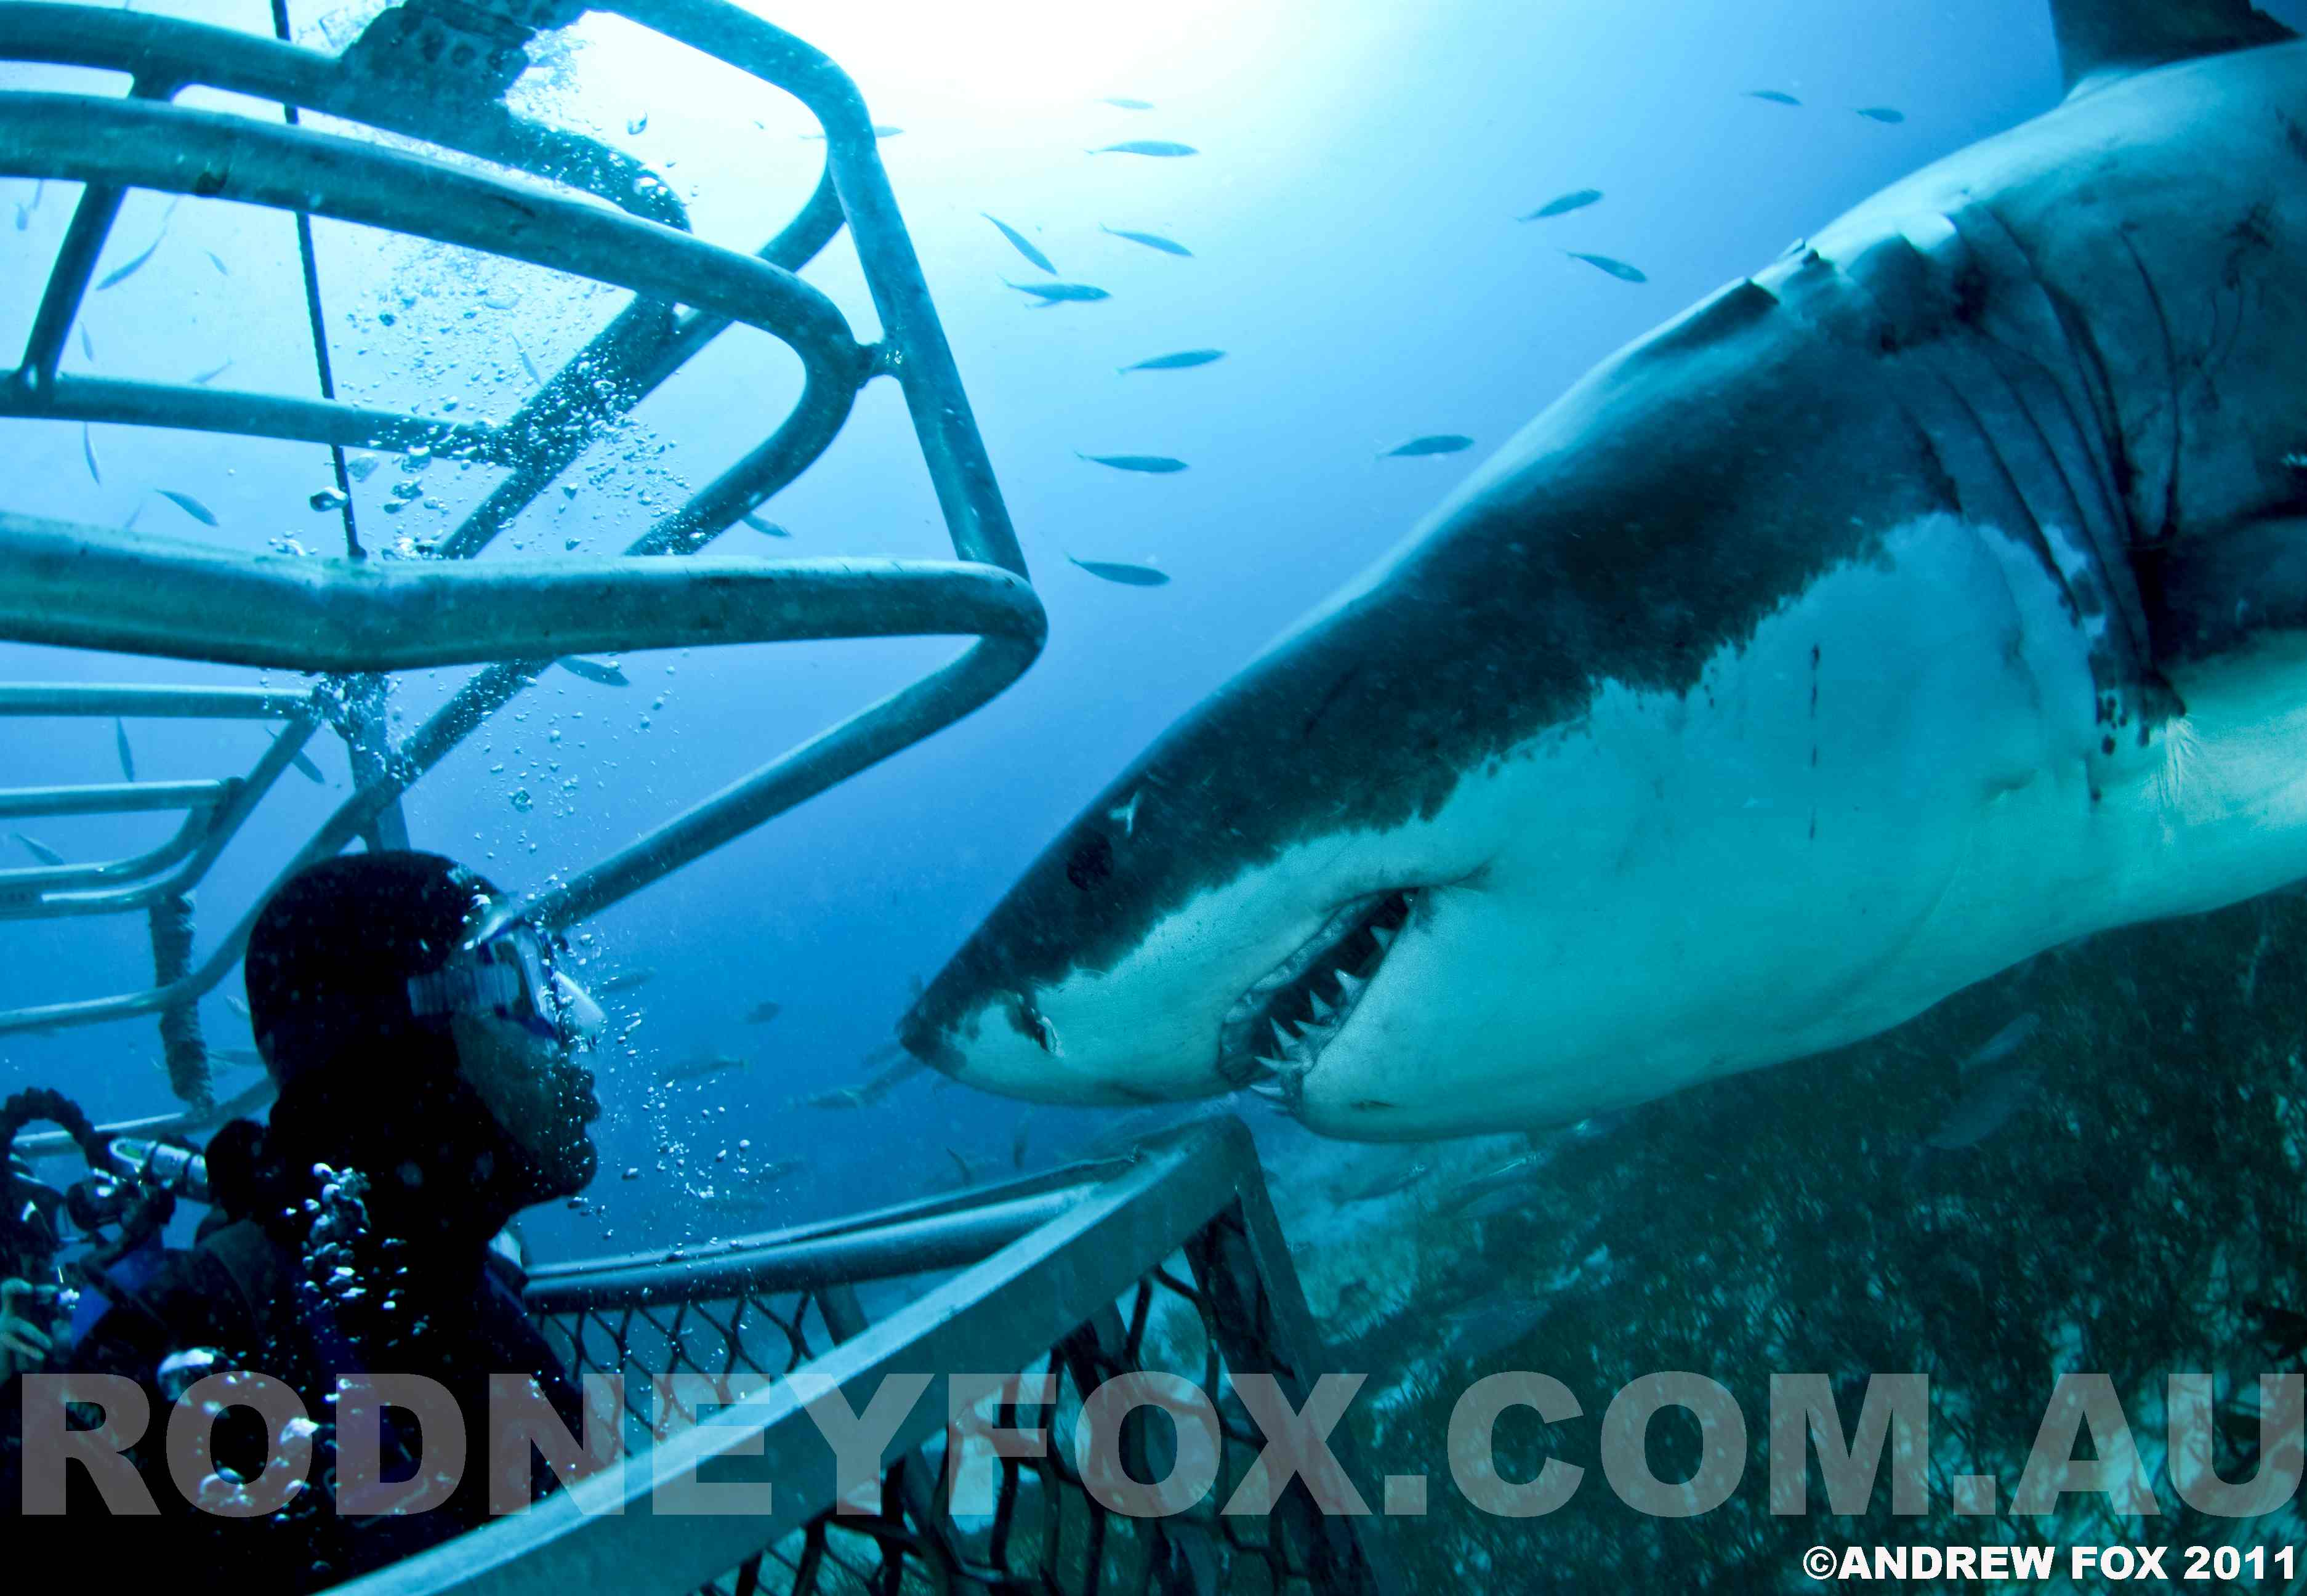 $1000 Rodney Fox Shark Expedition Gift Card